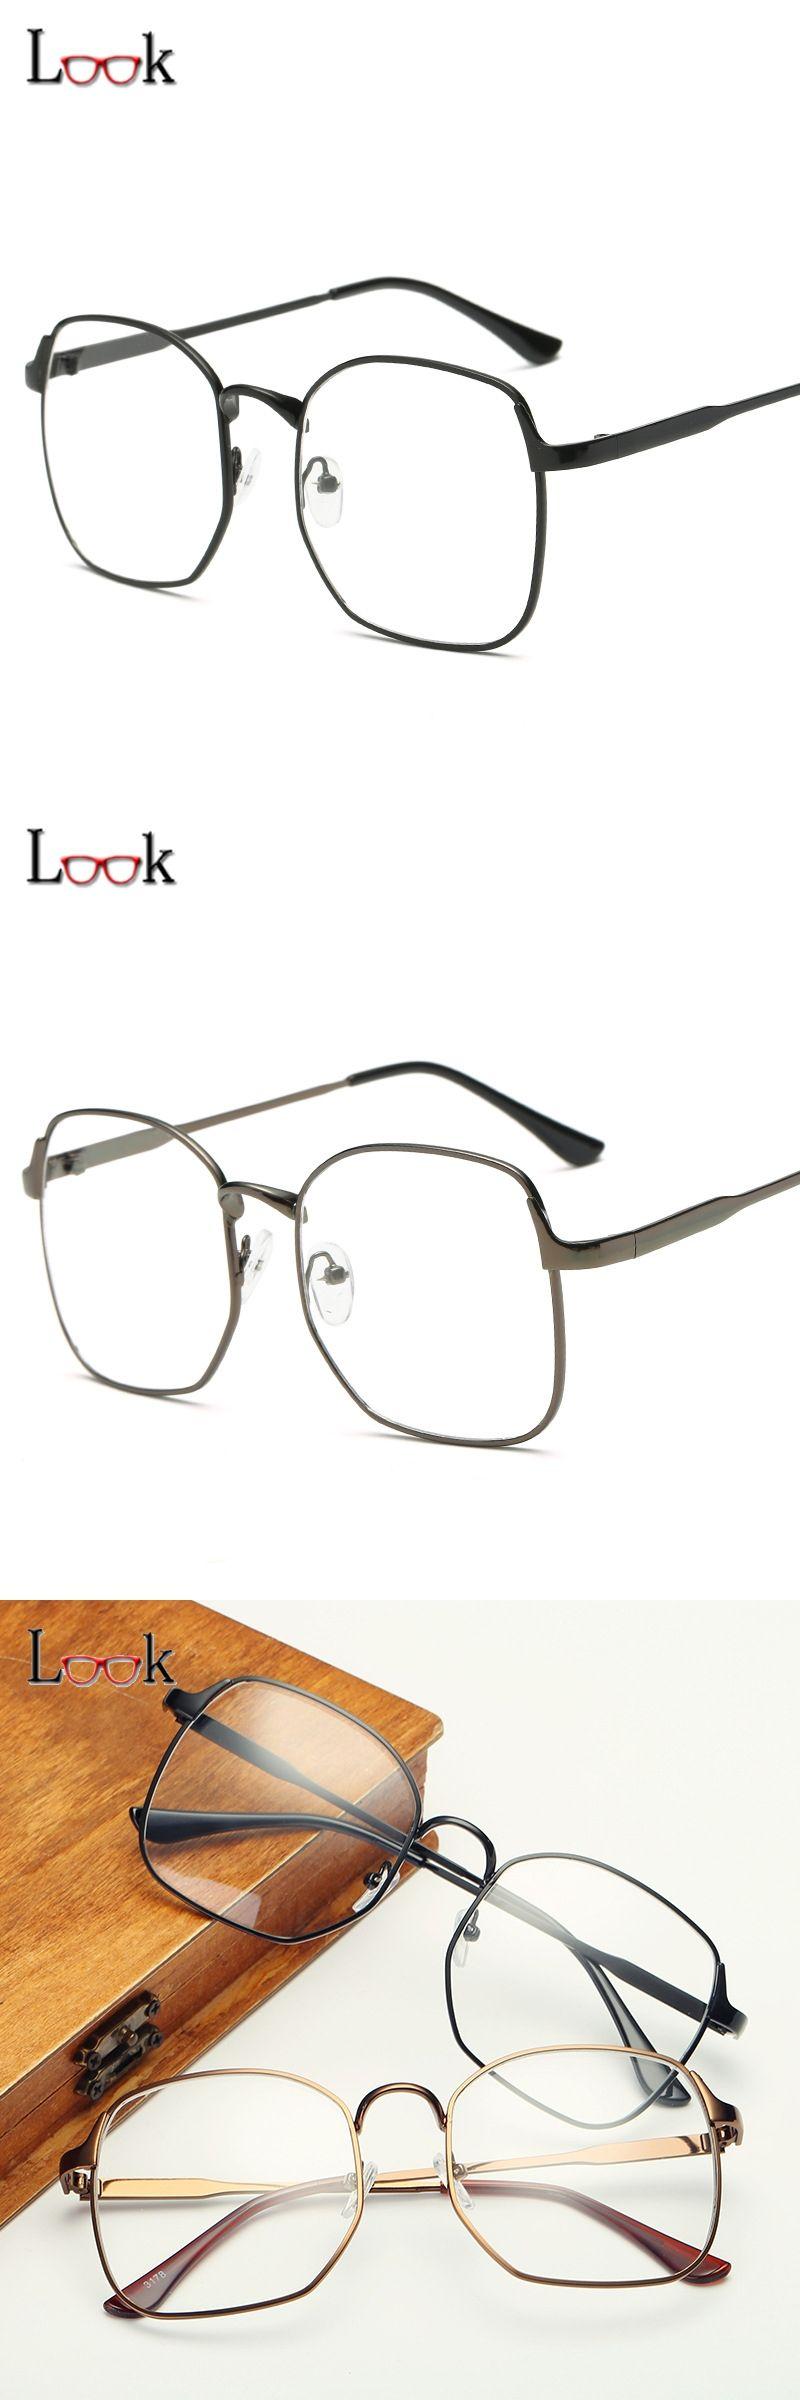 0a7f00a12bb9 New Arrival Glasses Frames For Women Men 2017 Top Quality Gold Metal Big Glasses  Optical Frames